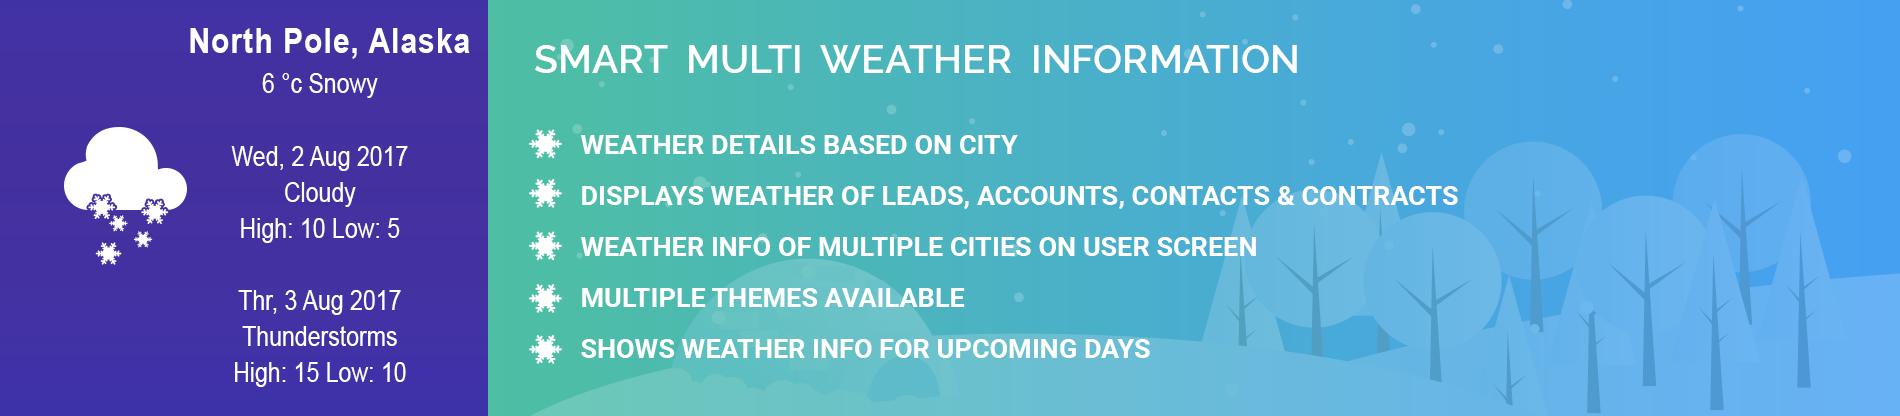 Smart Multi Weather Information